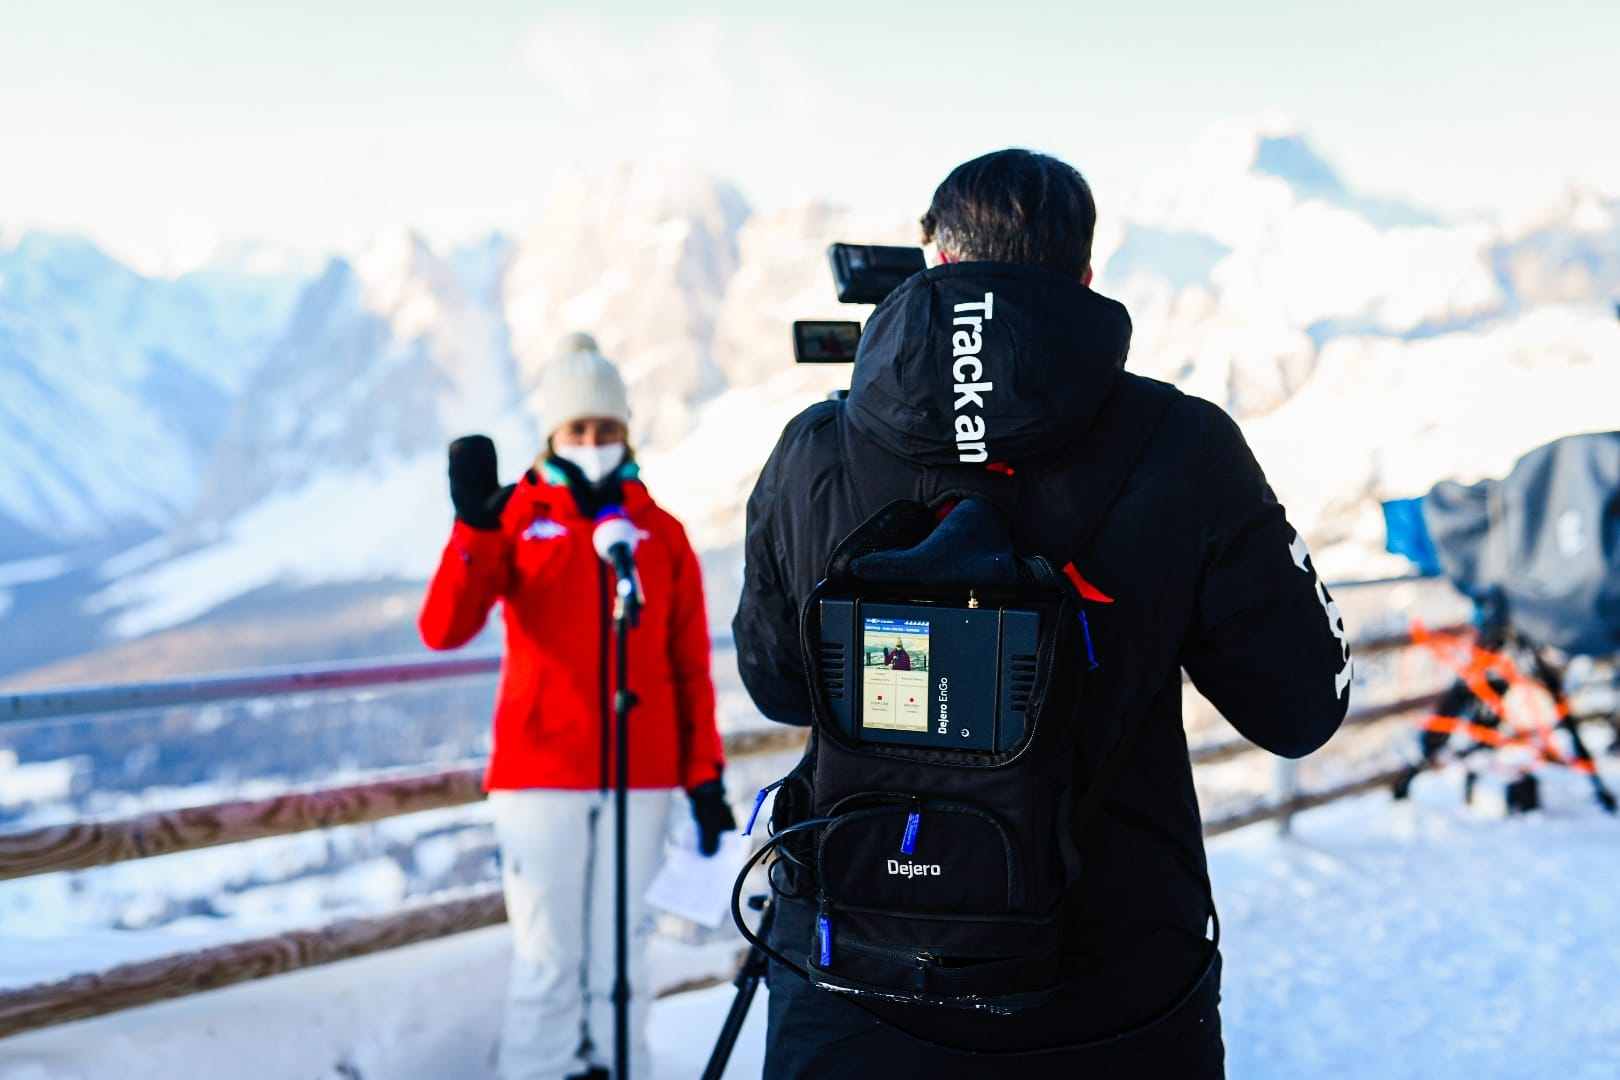 World Ski Championship - Image Credit: Nexting